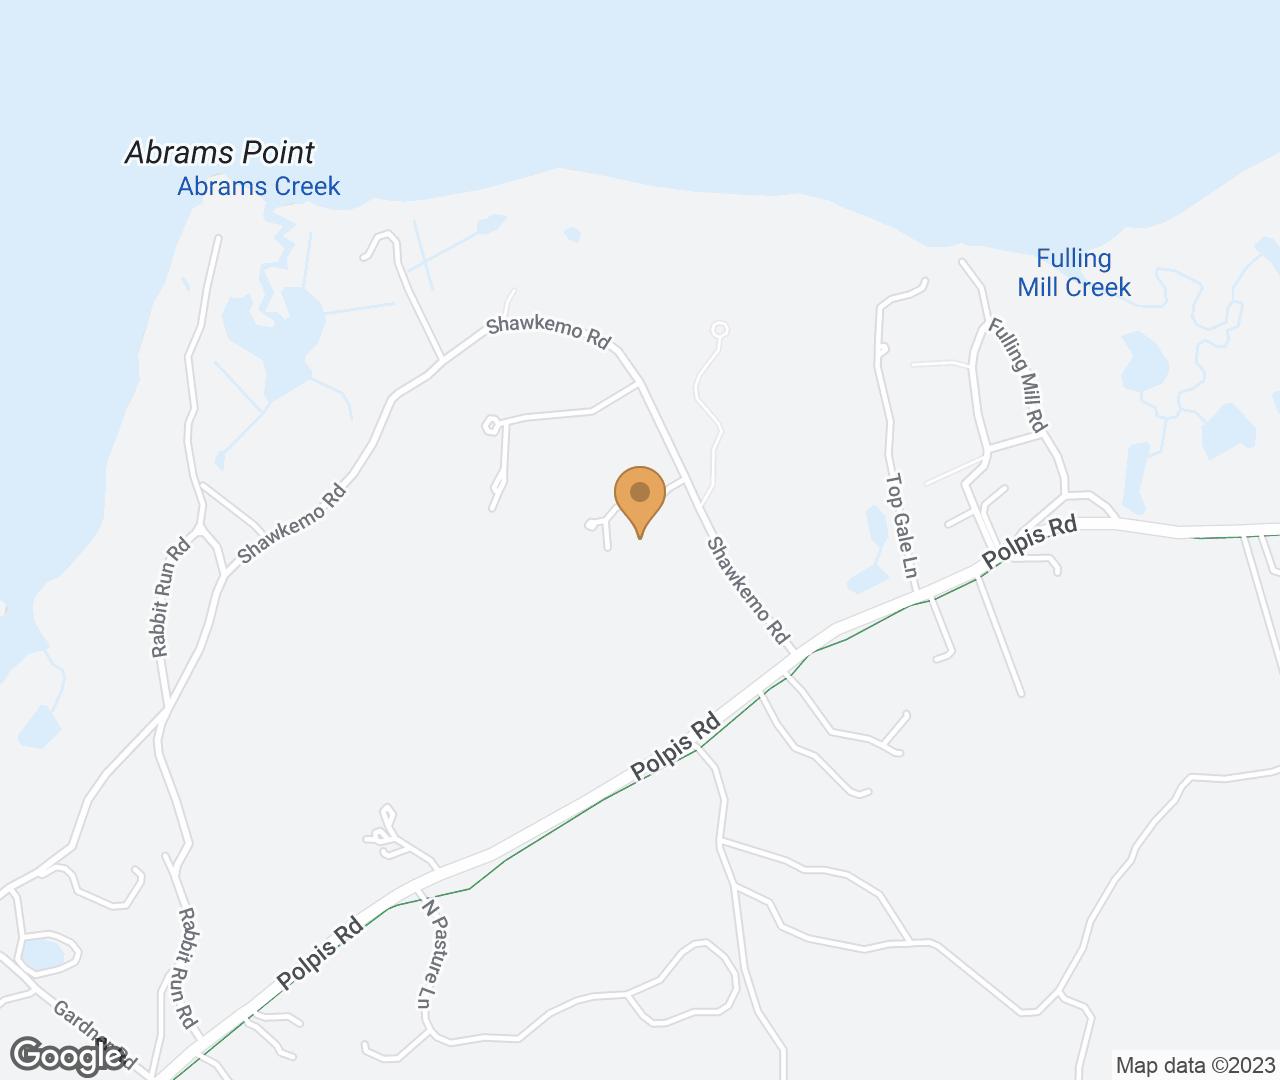 Google Map of 3 Shawkemo Hills Lane, Nantucket, MA, USA